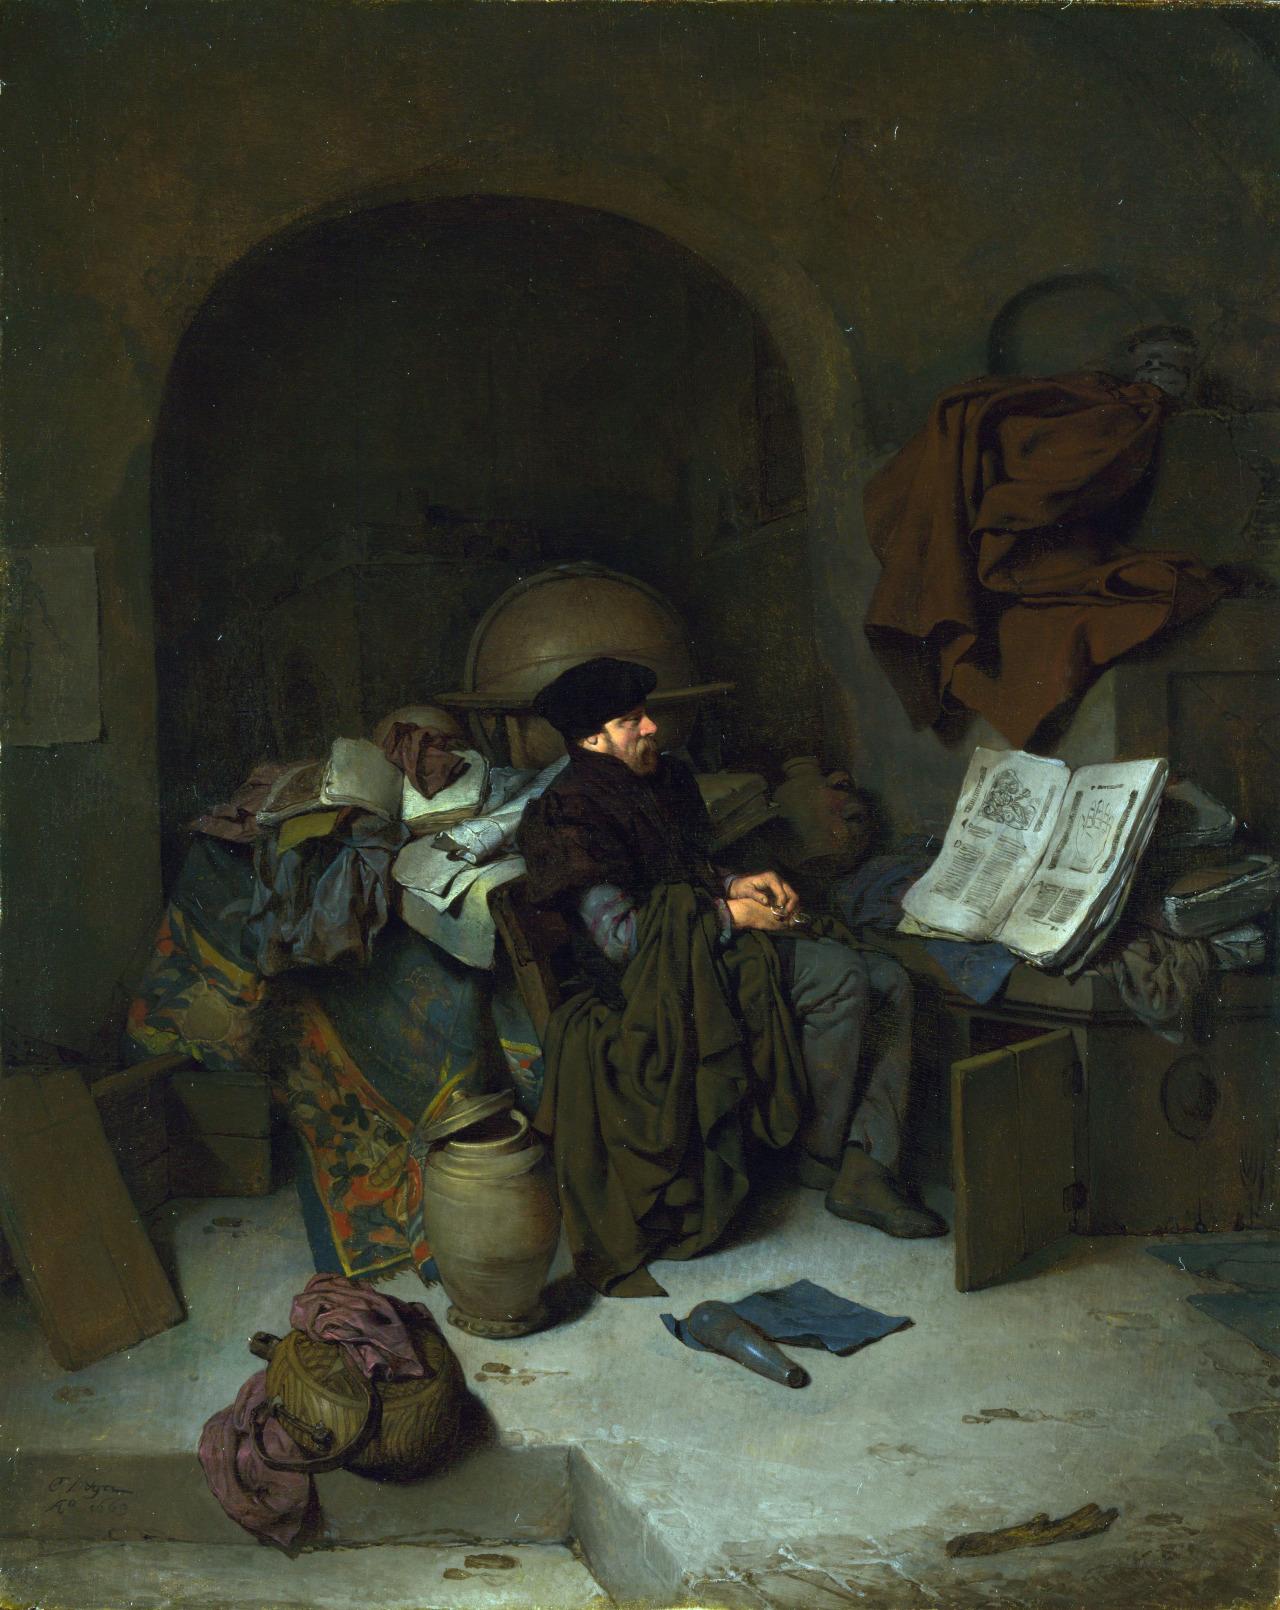 Cornelis Bega - An Astrologer